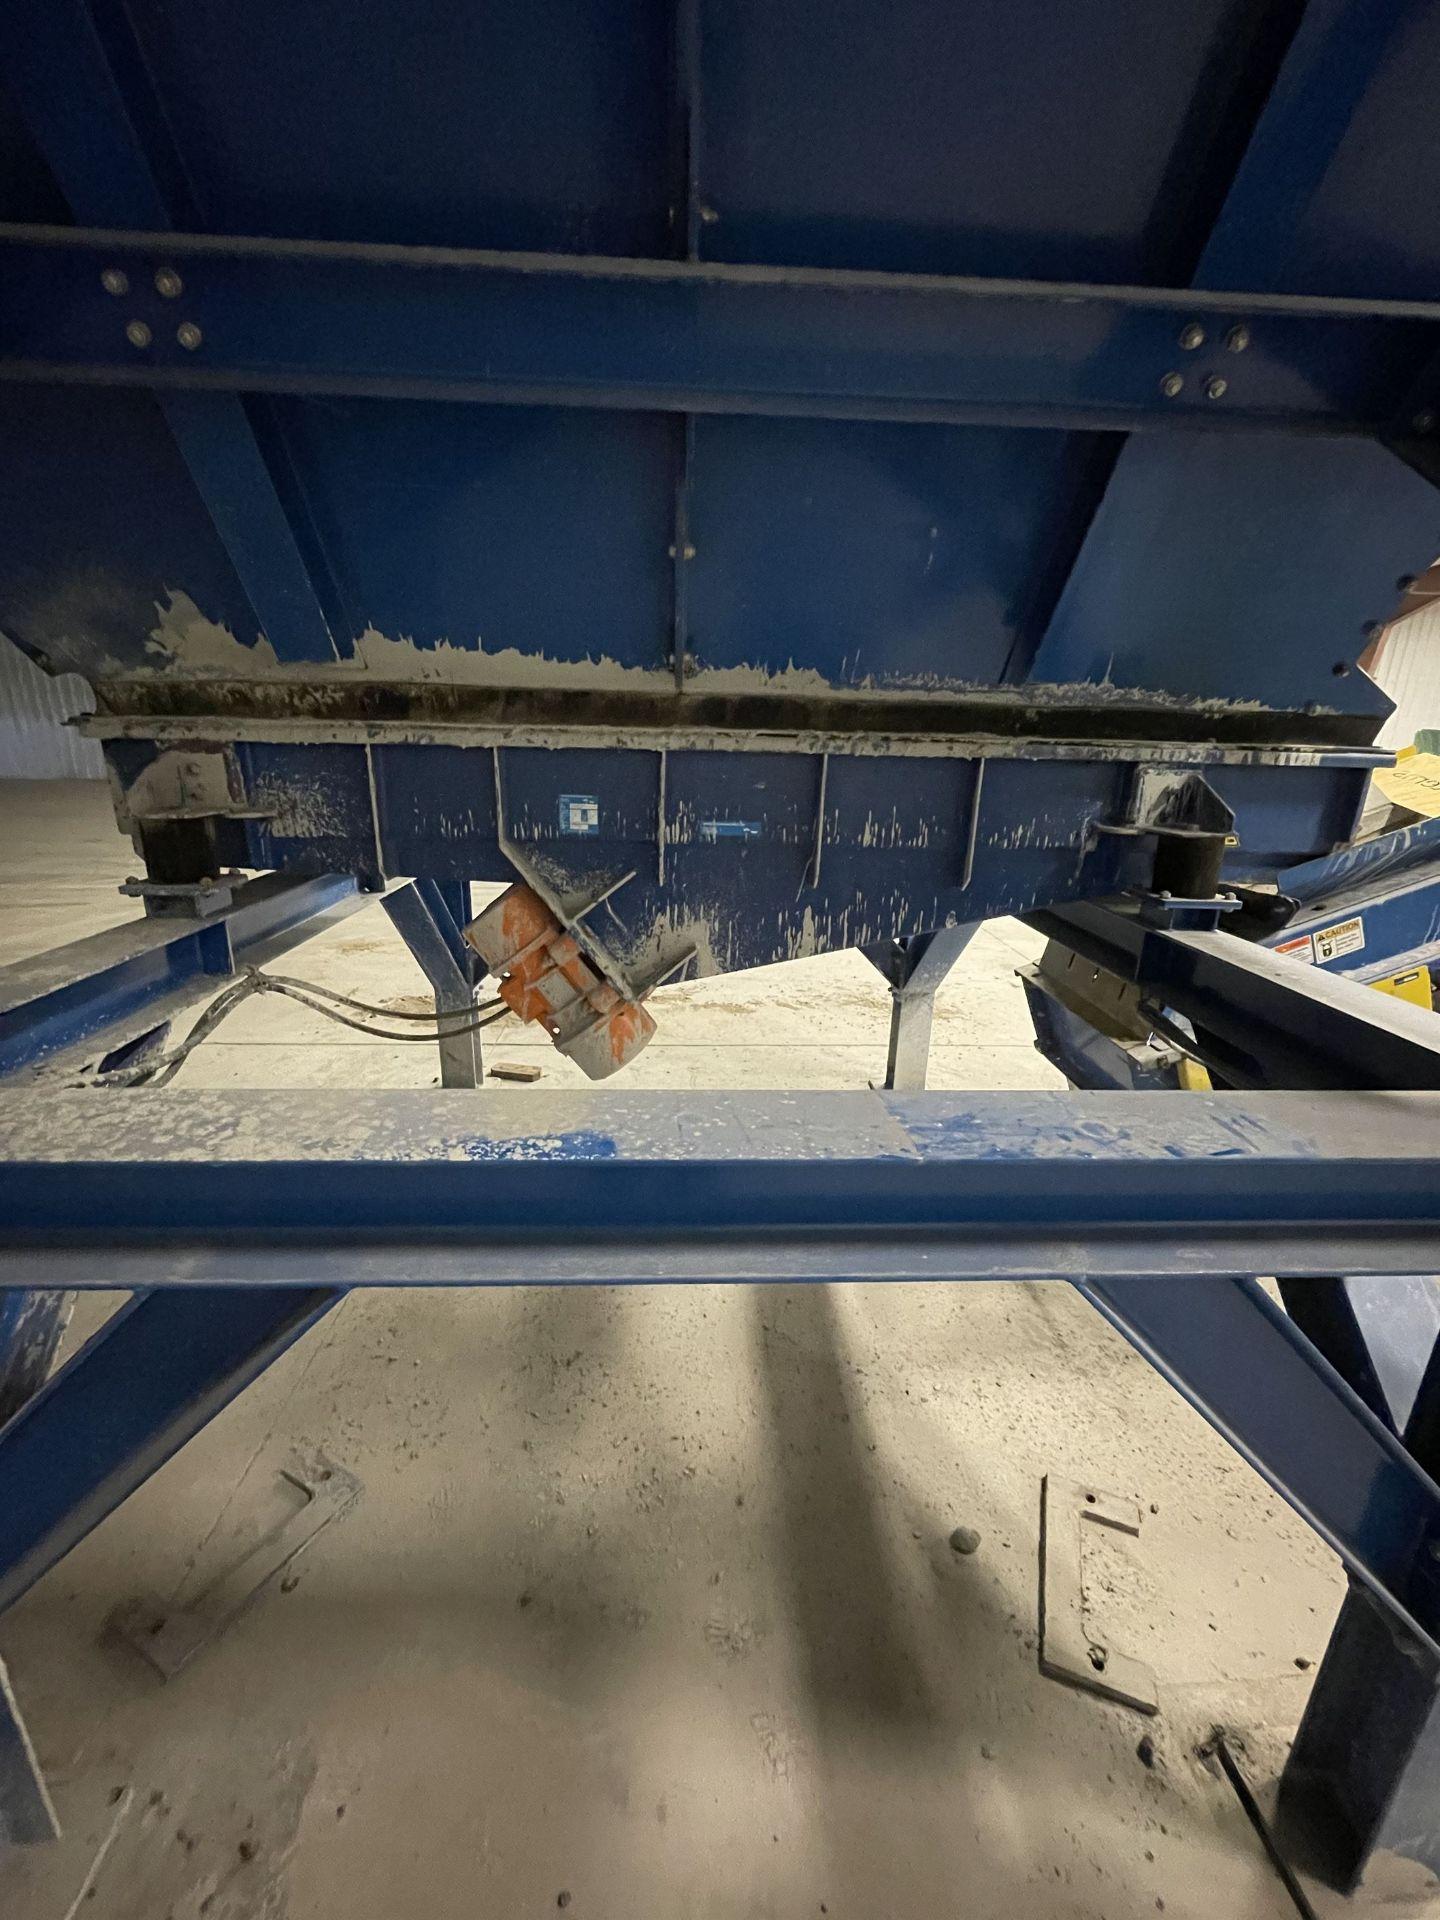 2015 SCREENING MACHINES HLOGO-60/300-25 Shaker Screen, s/n 1512A2186, 600 x 3000 x 250mm Trough, (2) - Image 4 of 12